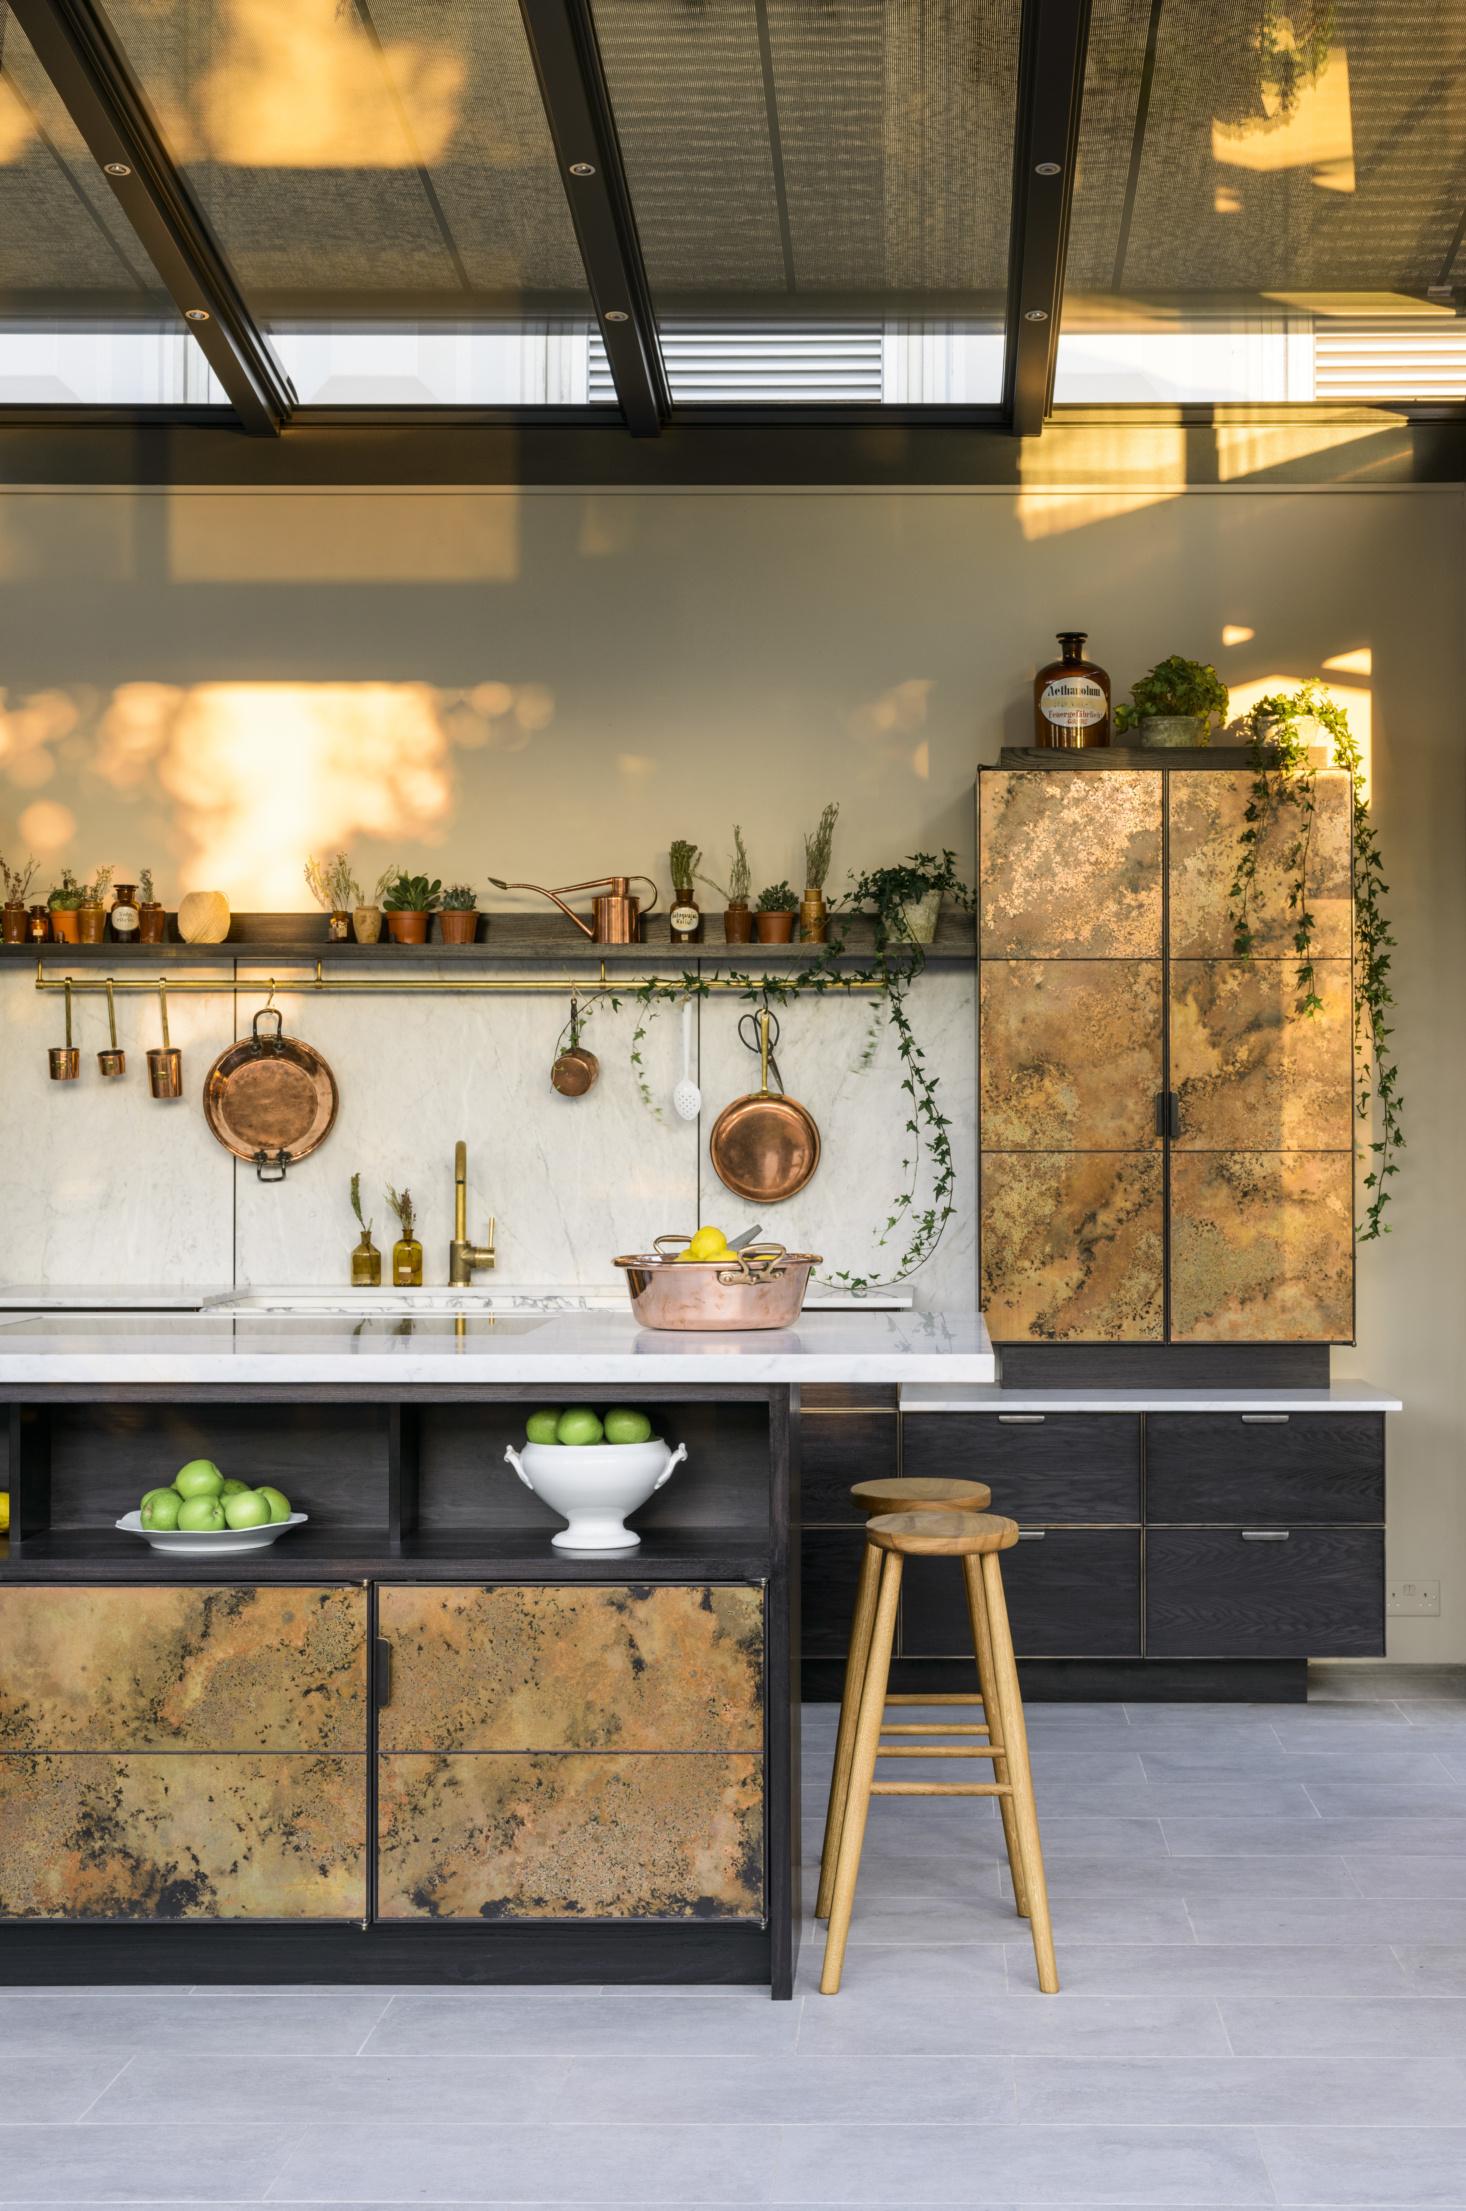 copper-kithcen-de-vol-autumnal-home-stylist-interiors-nancy-straughan.jpg